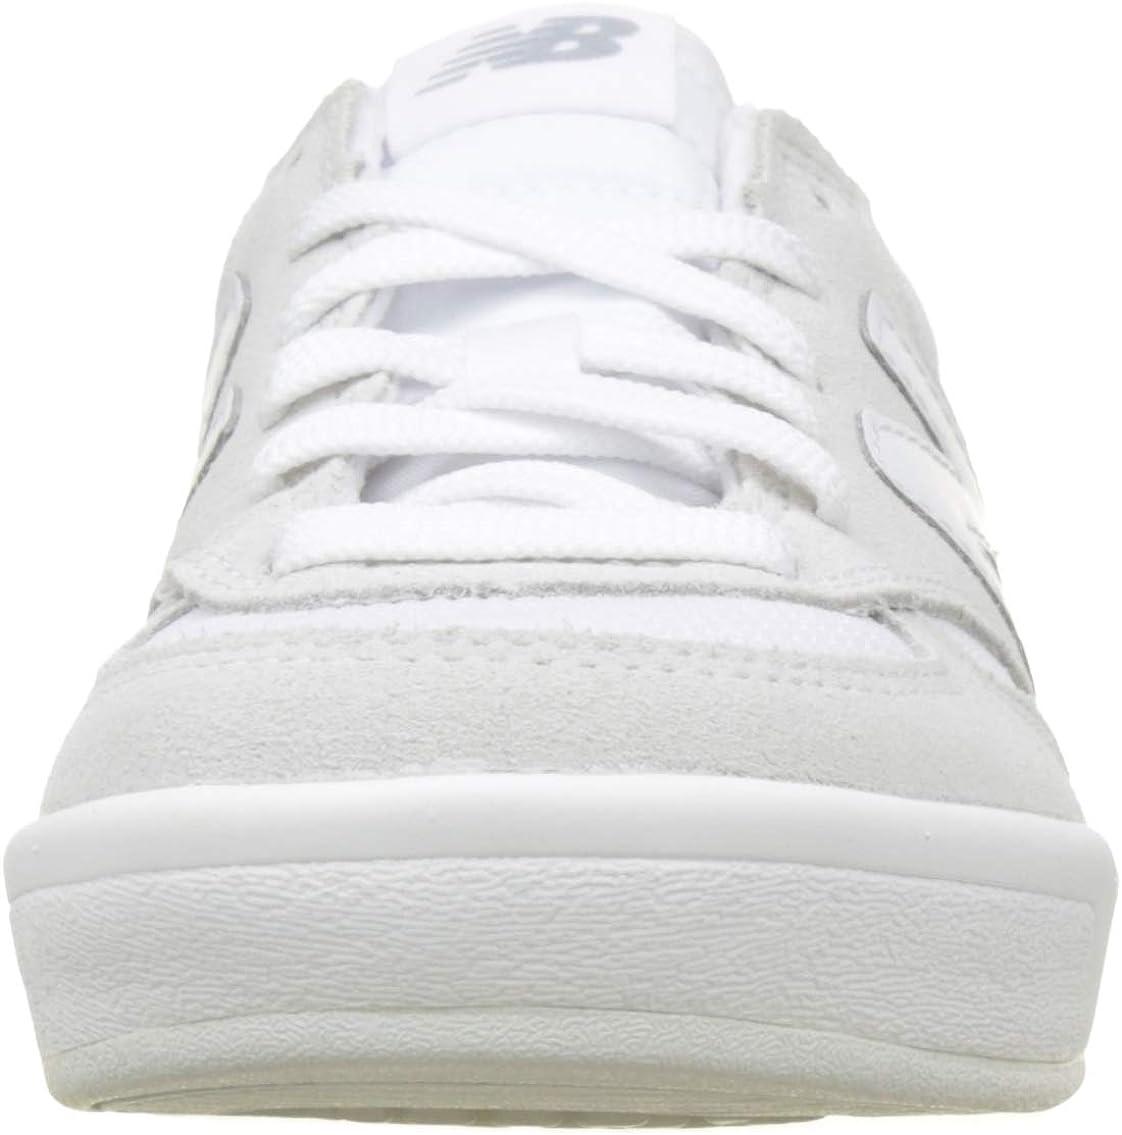 girasol Subproducto Legibilidad  Zapatos New Balance Wrt300 Zapatillas para Mujer Zapatos y complementos  saconnects.org